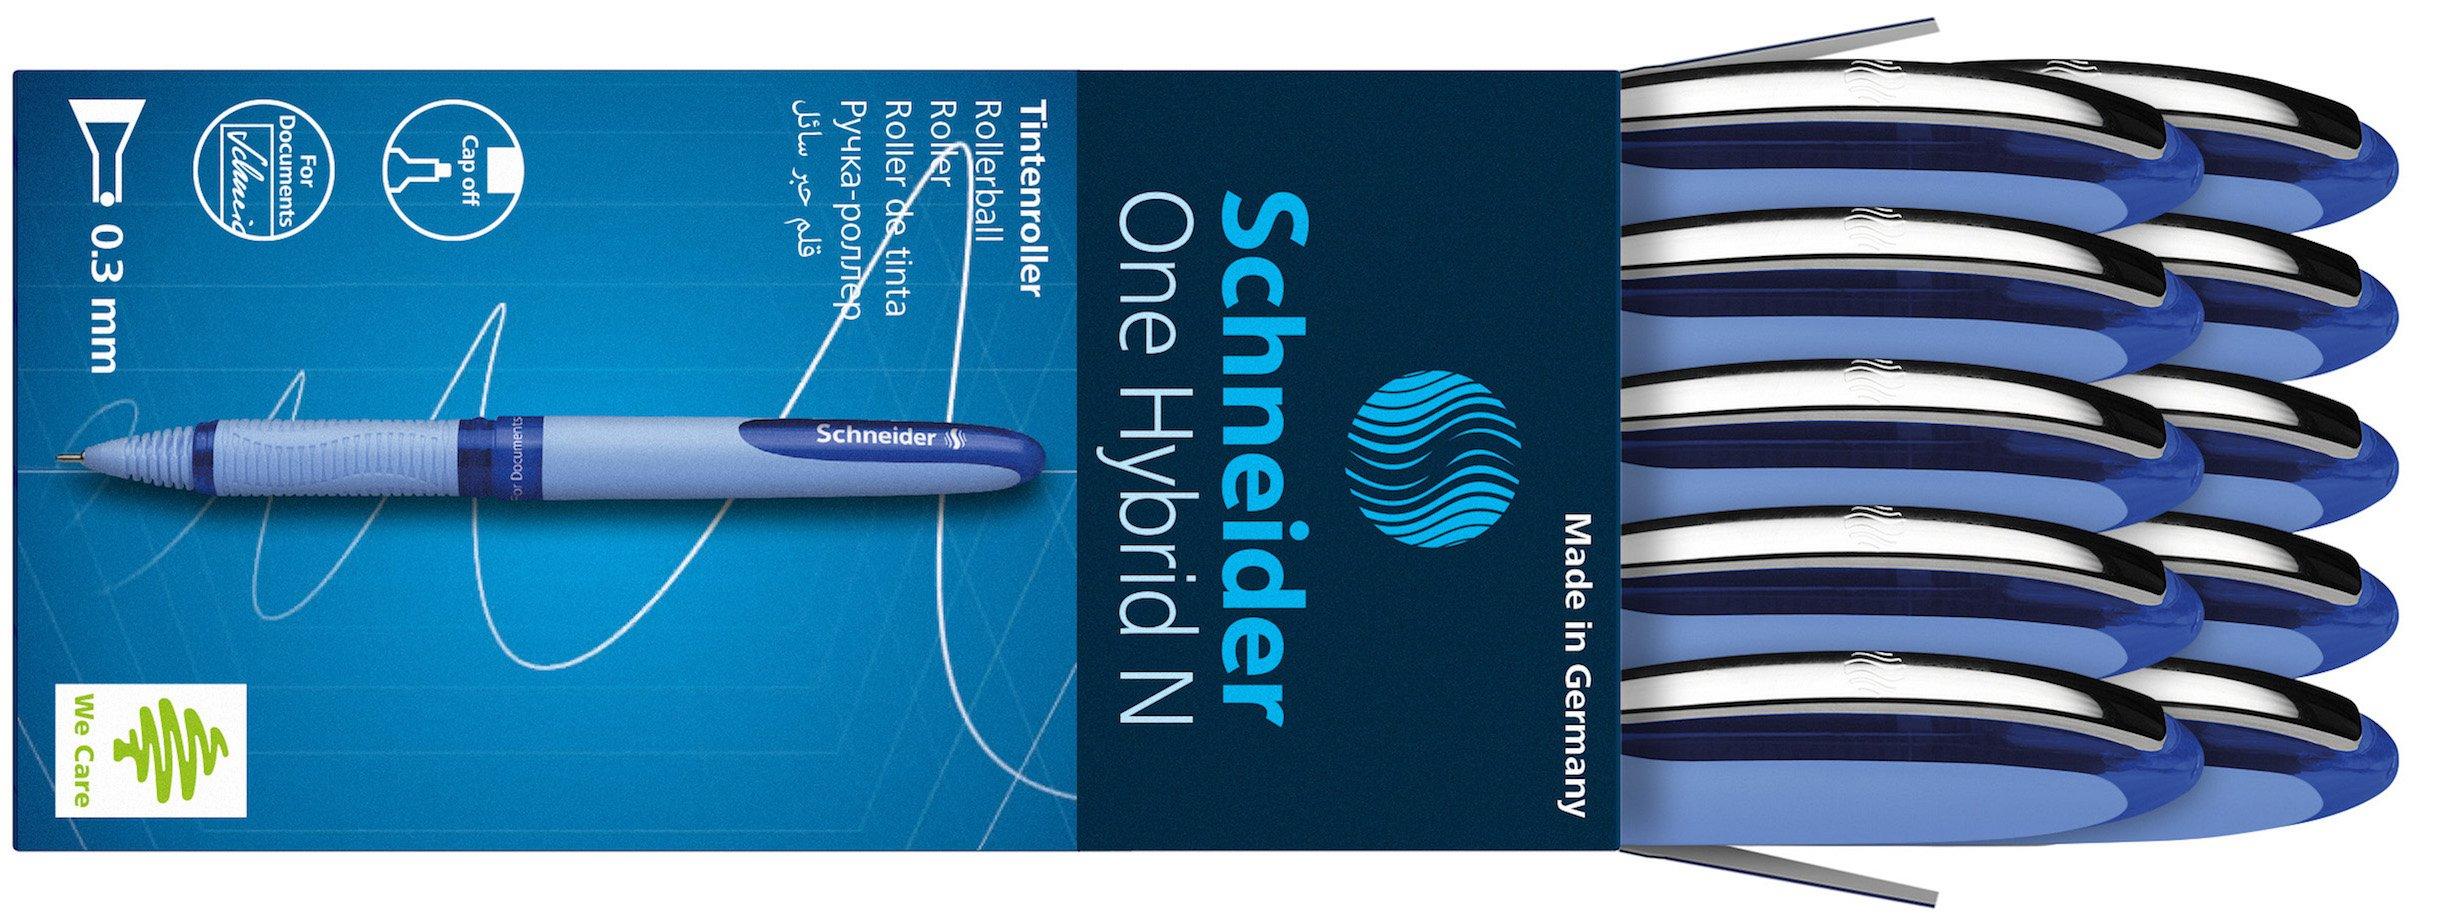 Schneider ONE Hybrid N Rollerball Pen, 0.3mm, Blue, Box of 10 (183403)